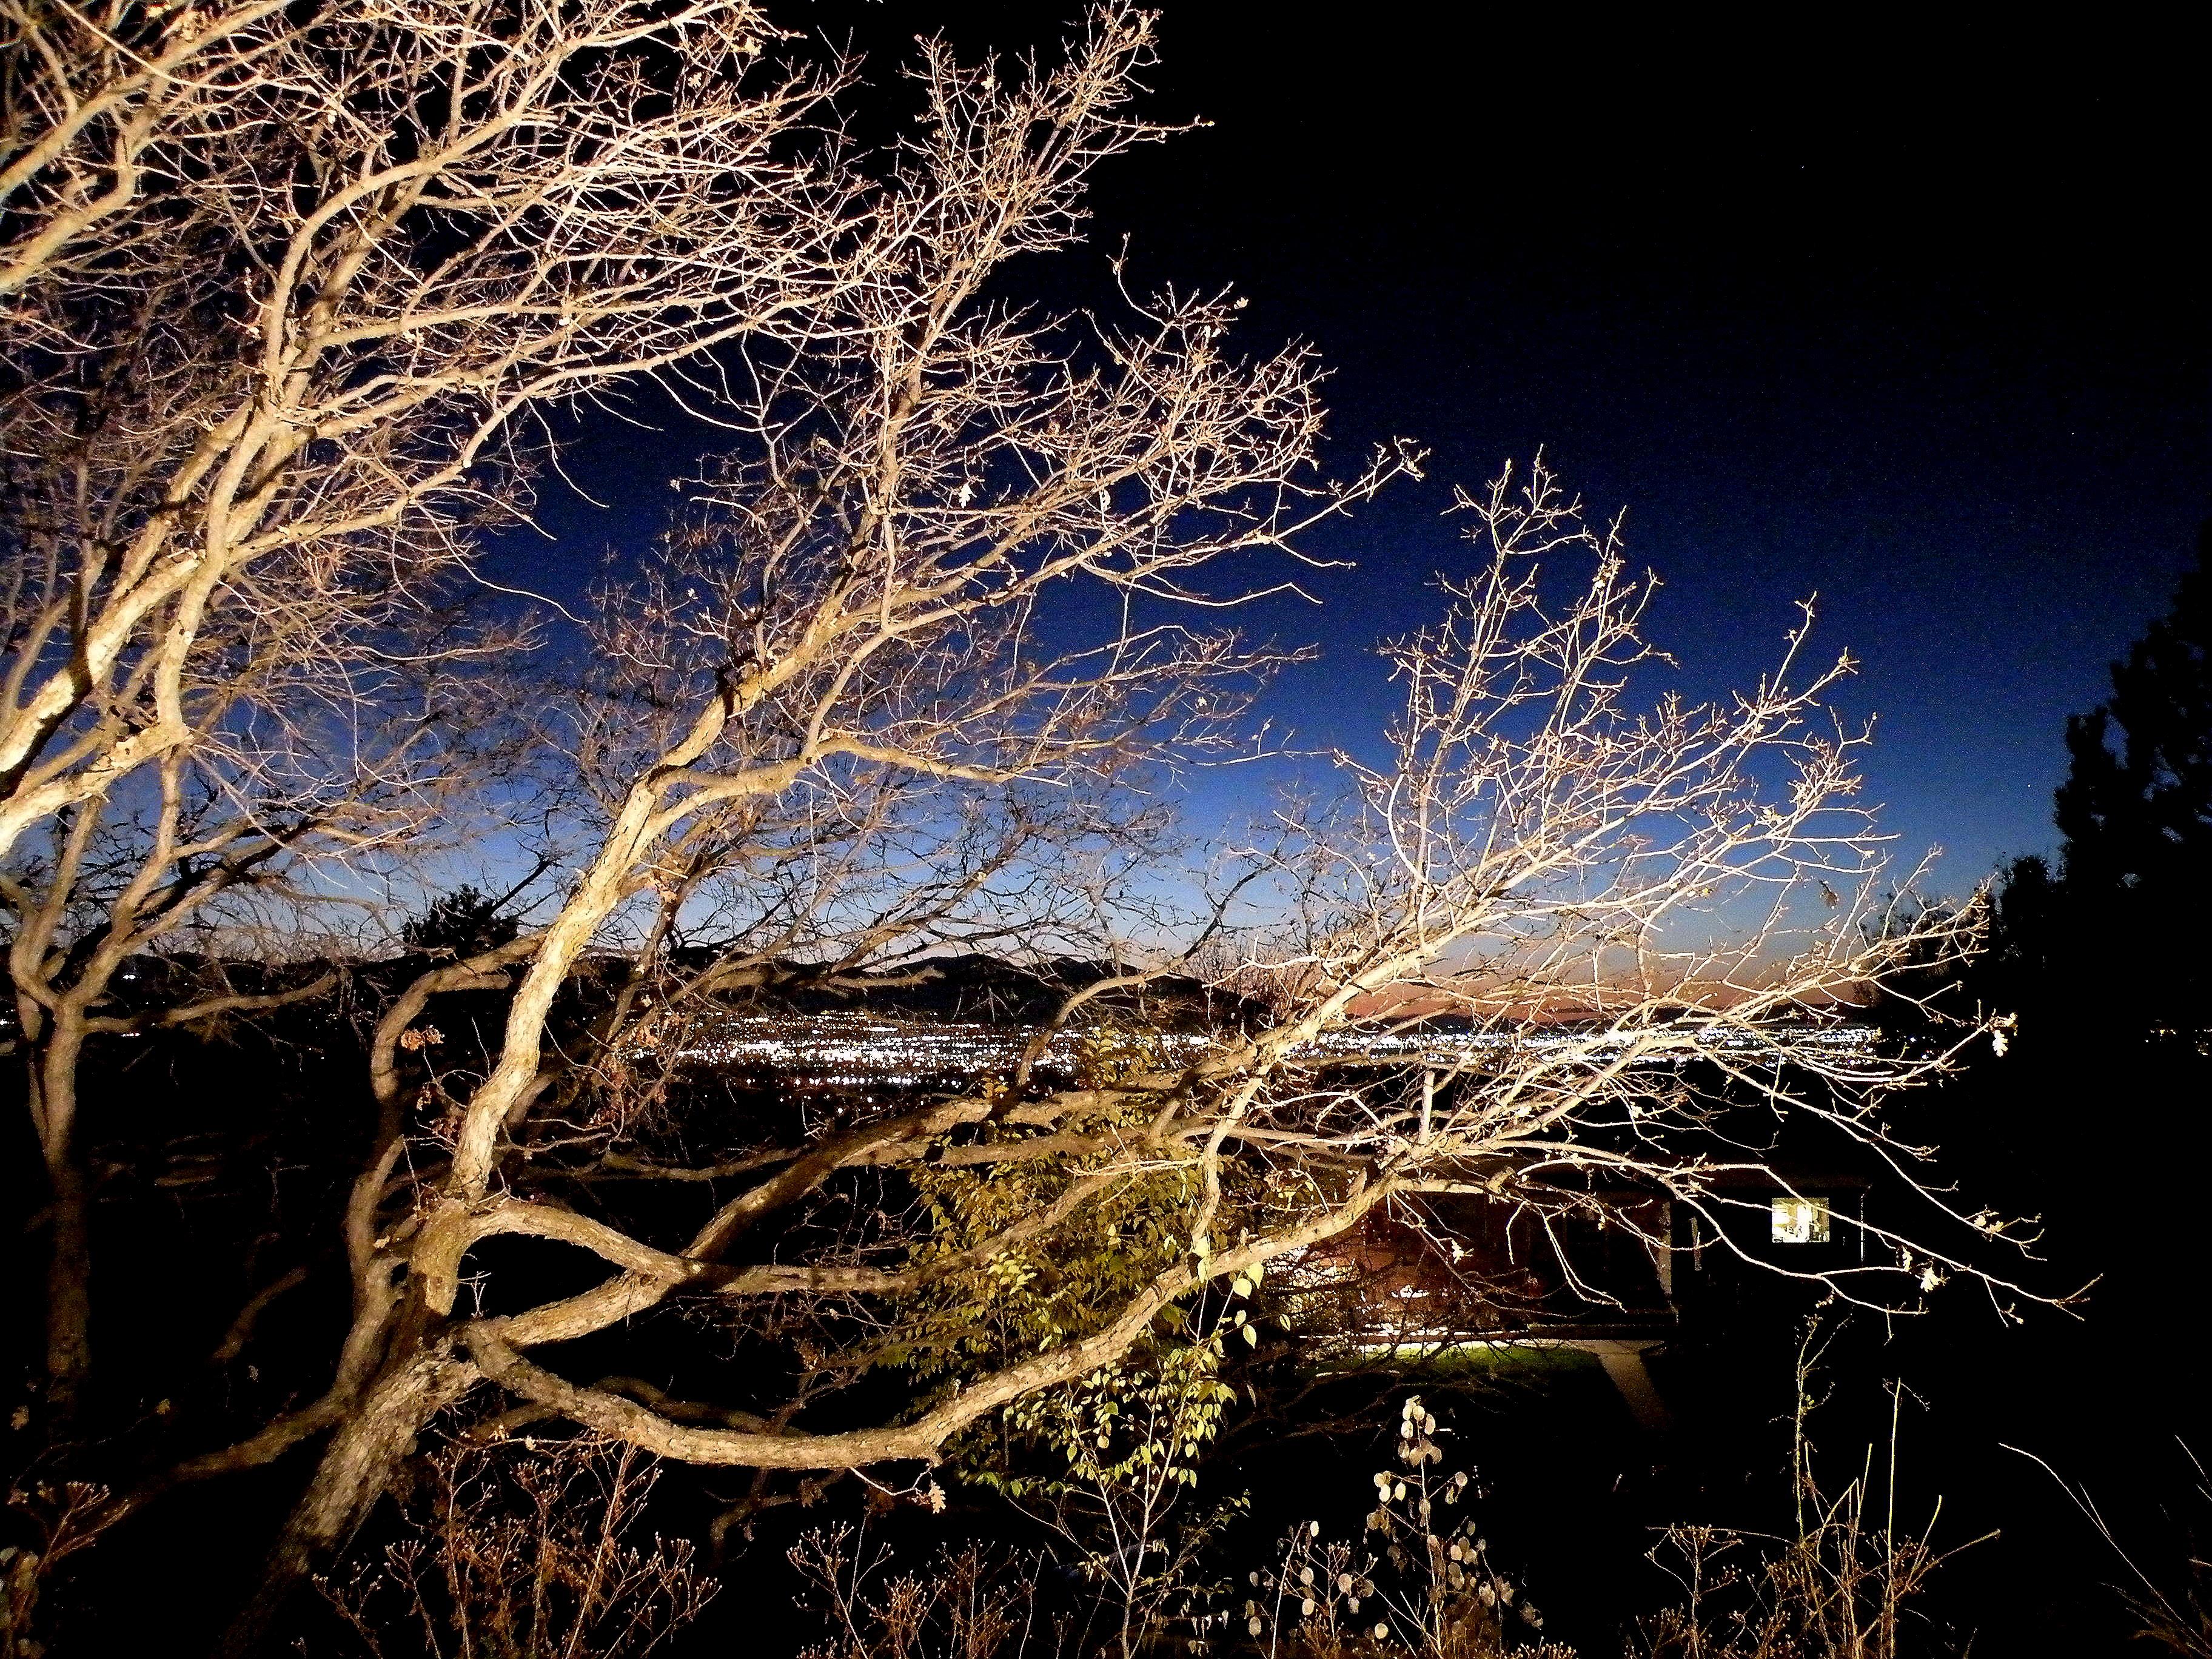 Gambel oaks overlook the Salt Lake Valley. Erin Alberty|The Salt Lake Tribune